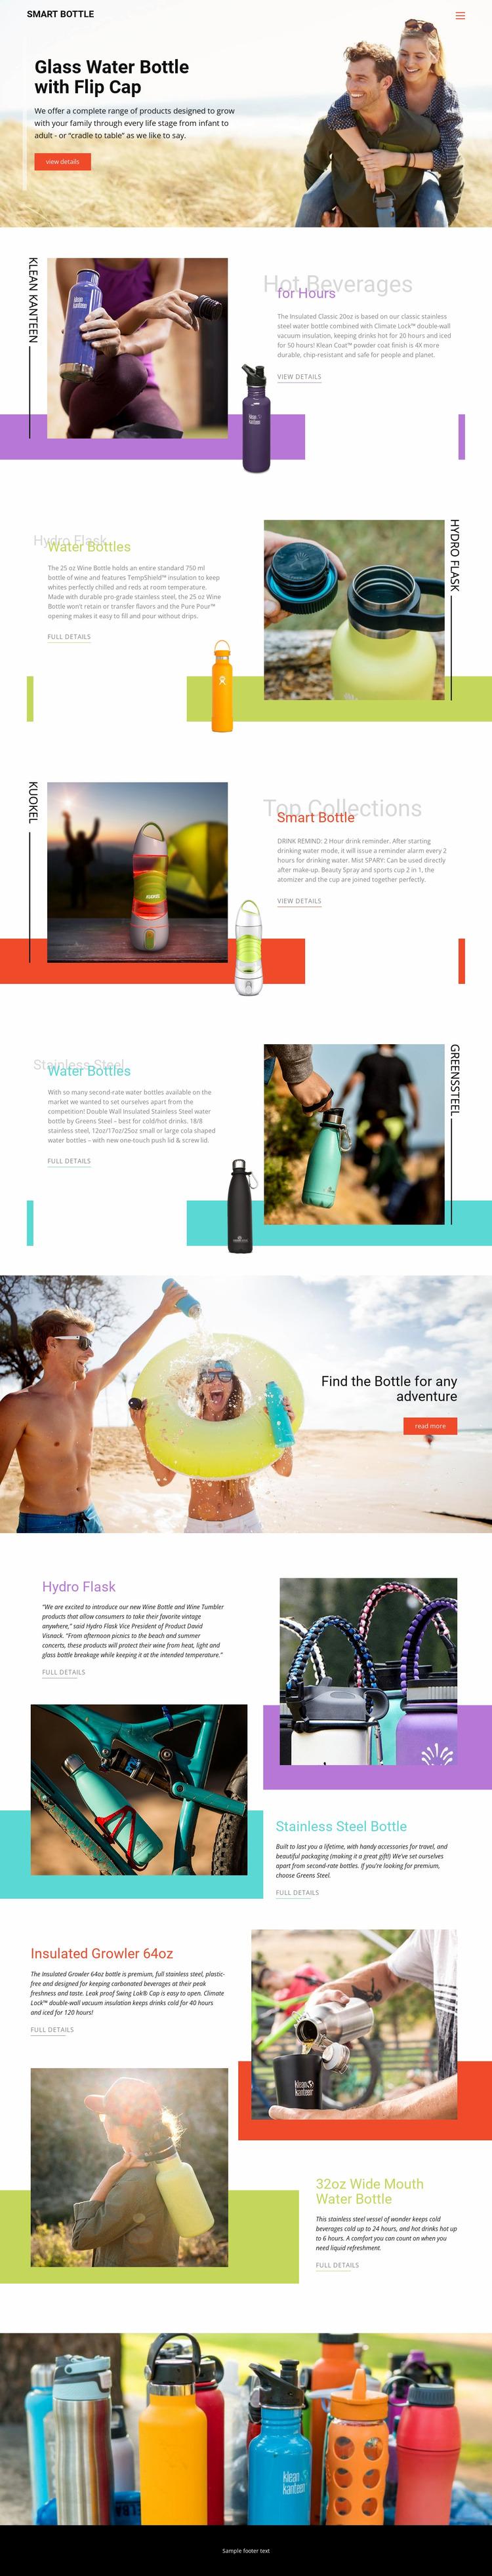 Water Bottles Website Mockup